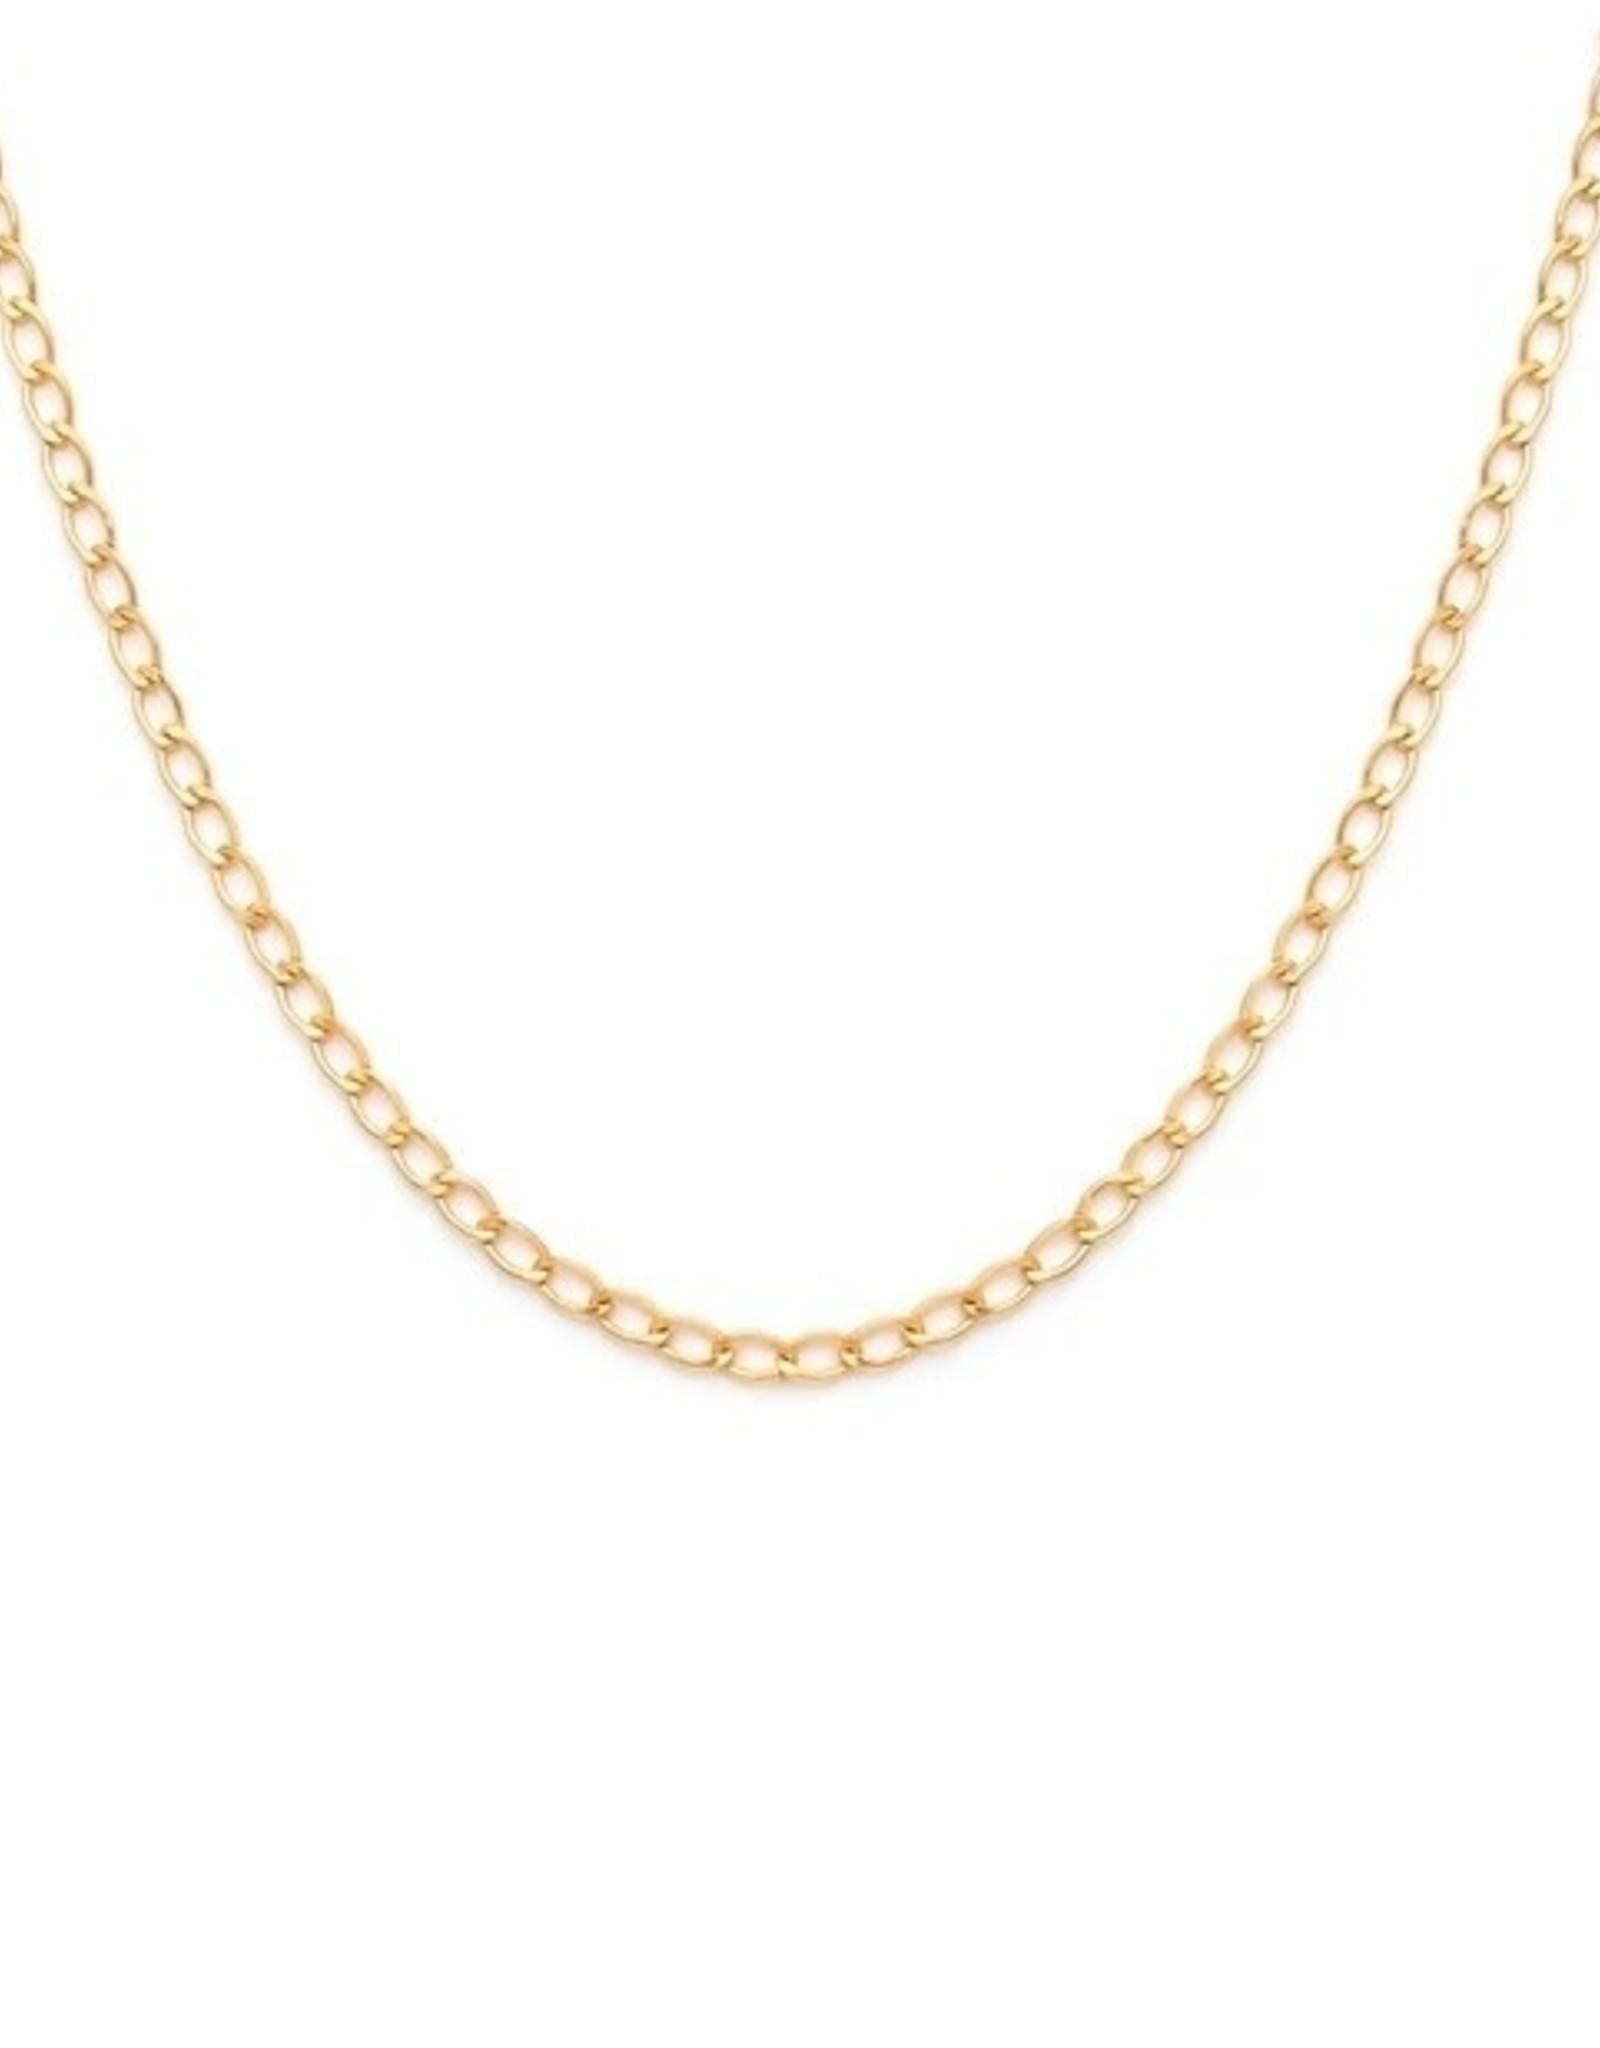 LEAH ALEXANDRA Alba Necklace 14K Gold Fill